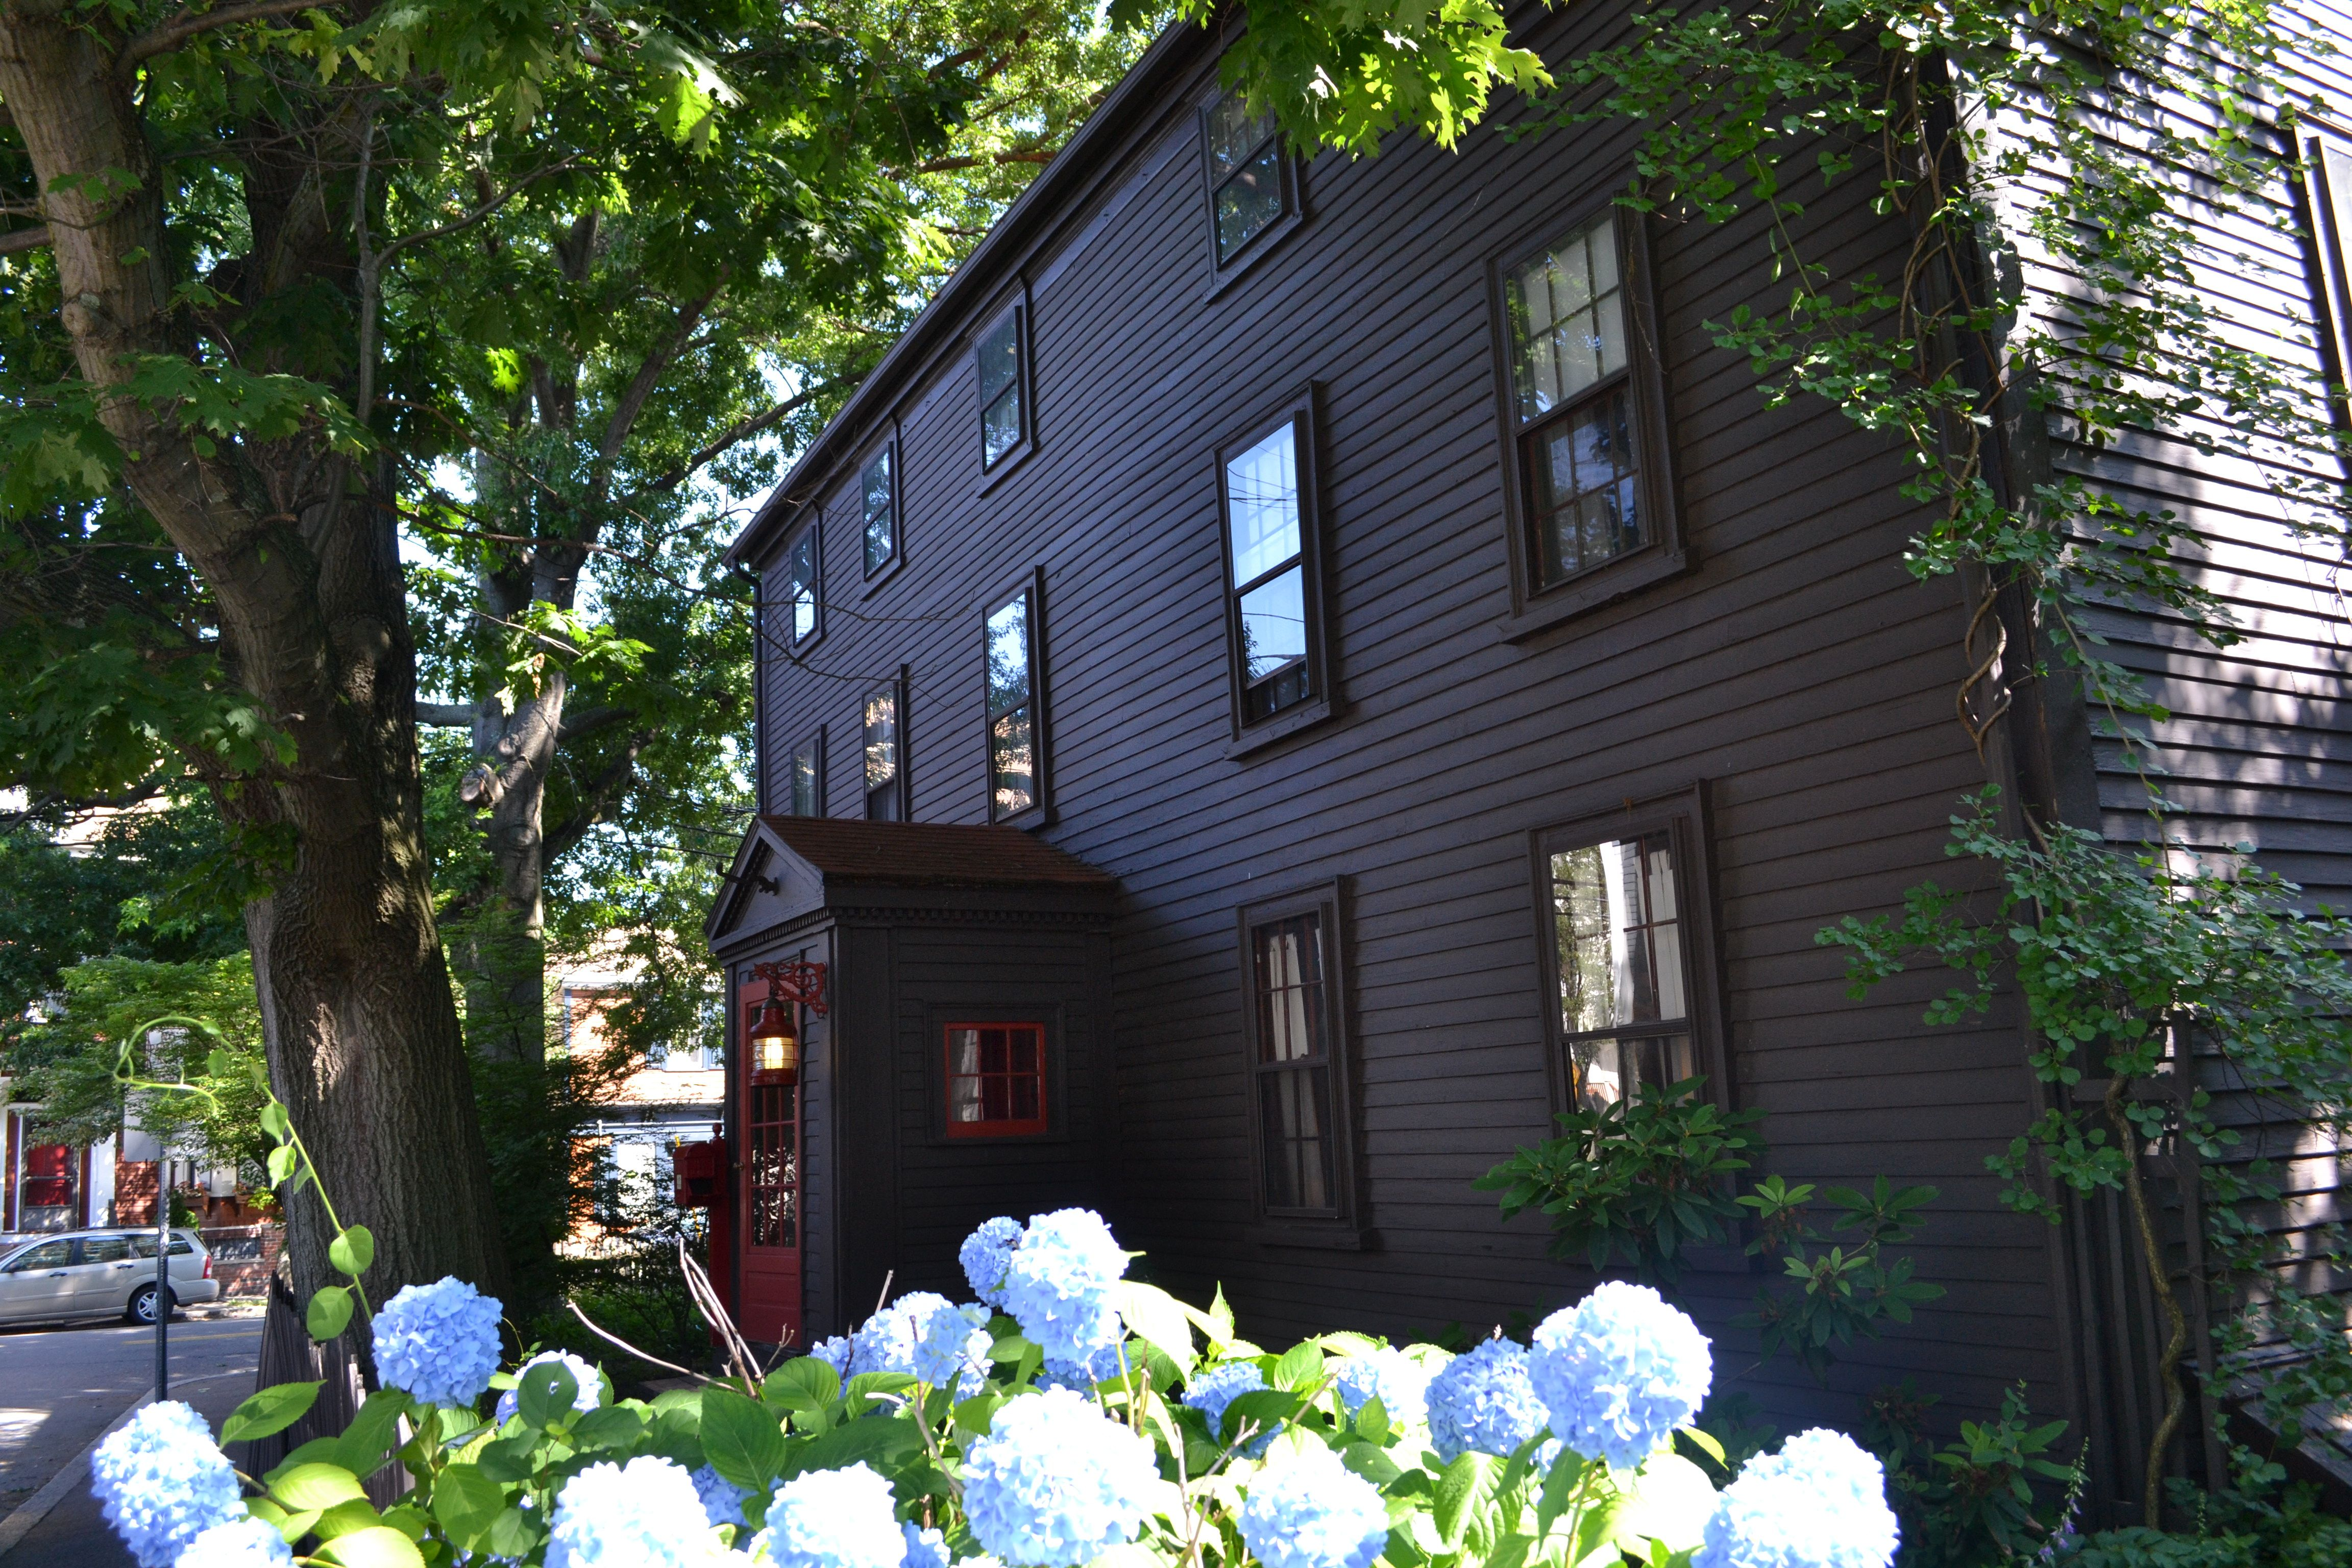 Stephens Daniels House July 2013 in 2019 Salem mass, Bed